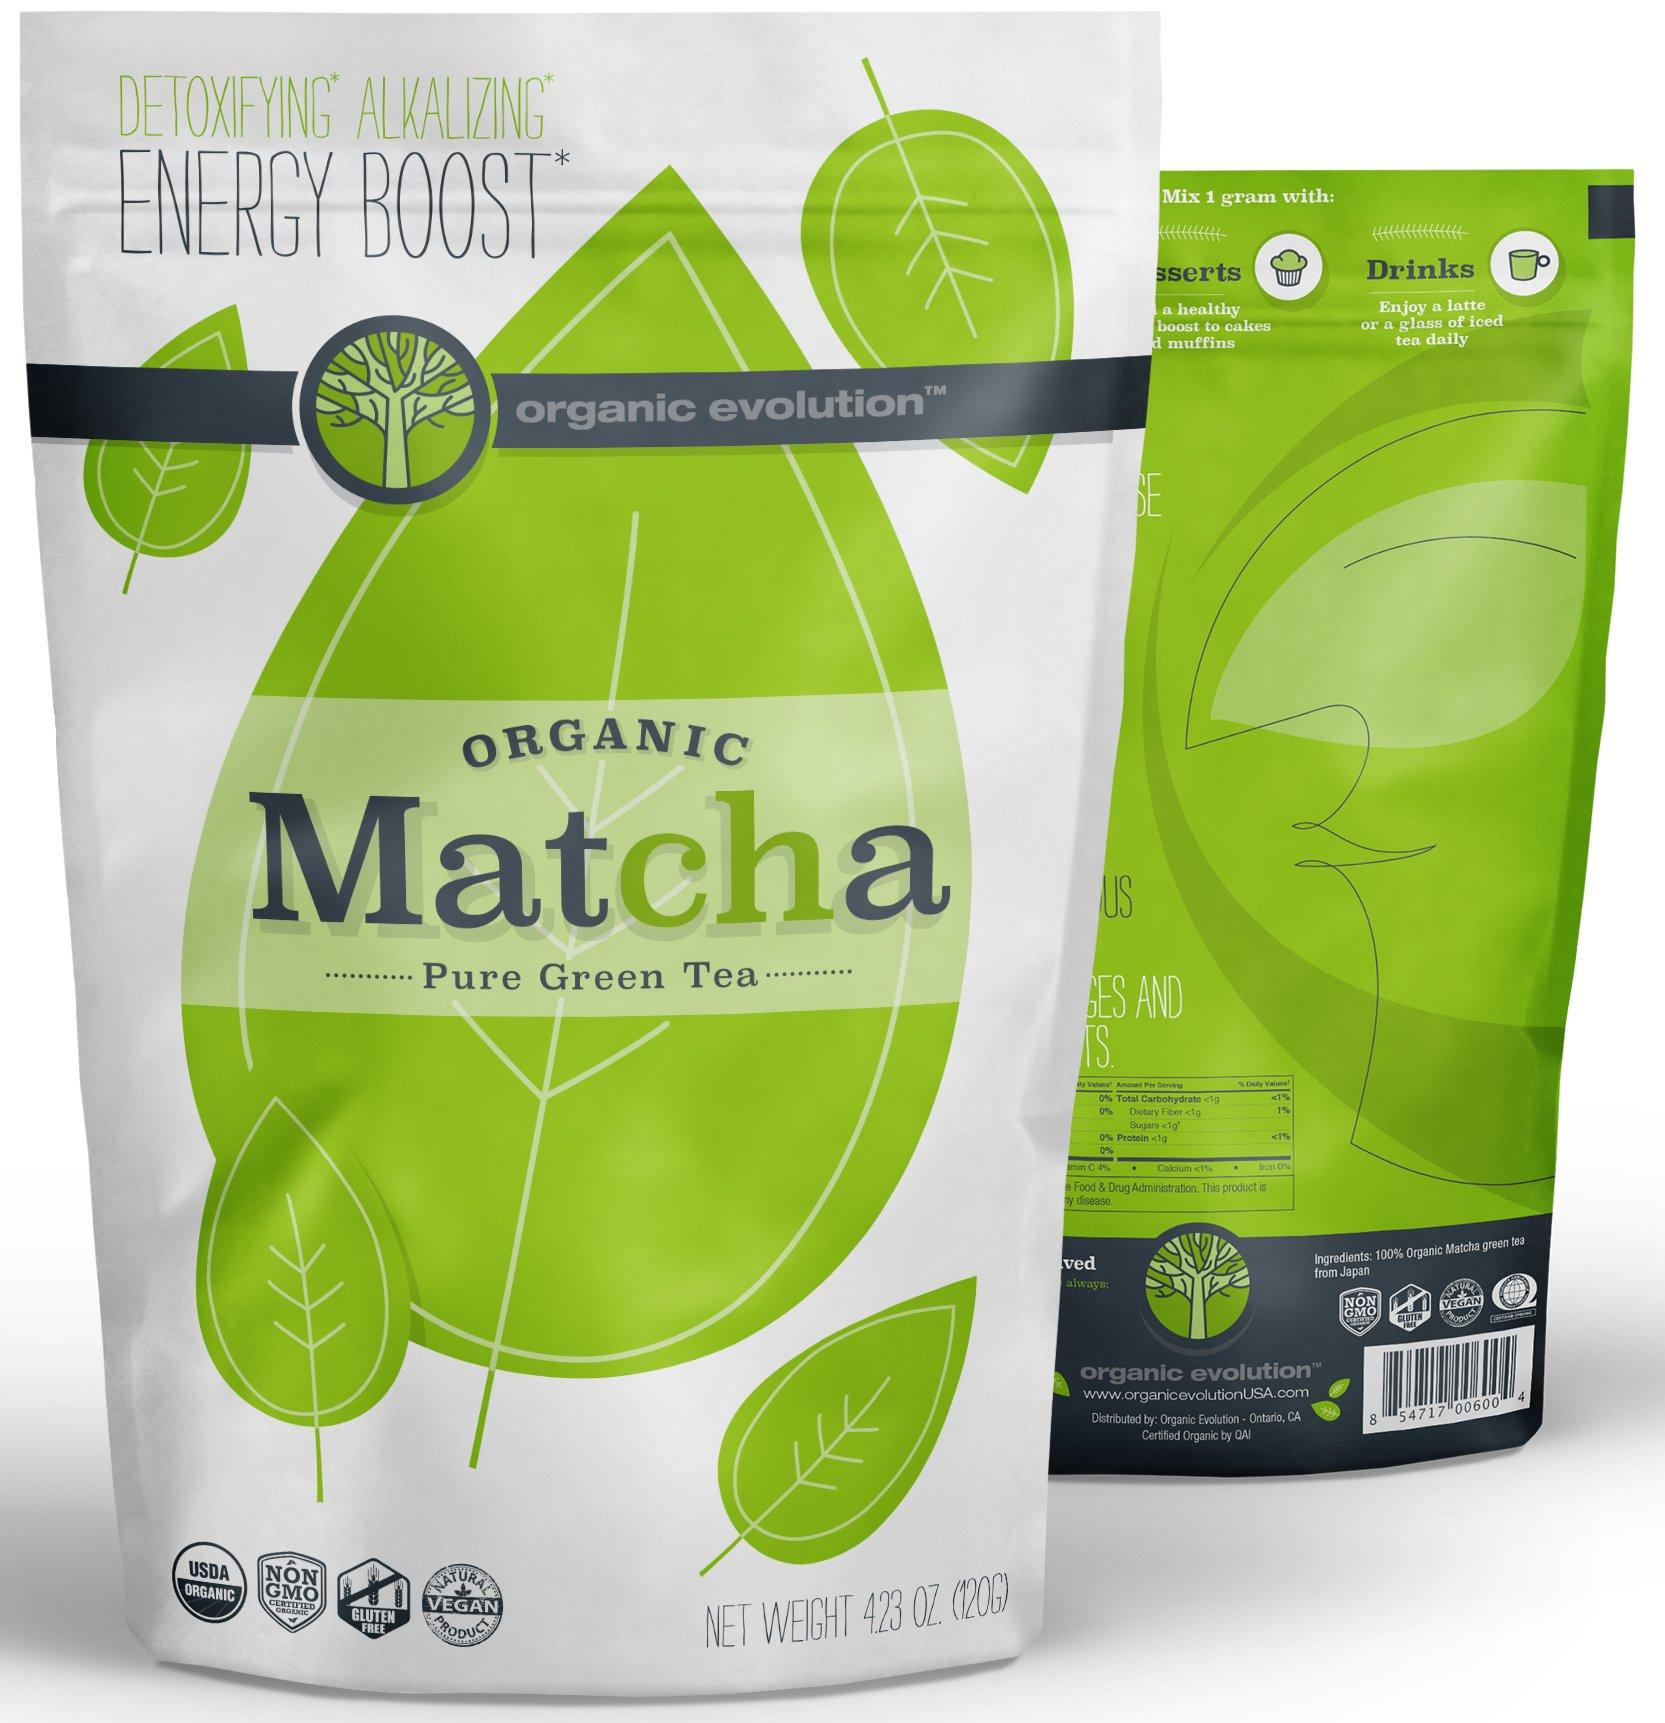 Organic Evolution - Japanese Matcha Green Tea Powder - USDA Certified, Authentic Japanese (Kyoto) Powder - Lattes, Baking, Recipes, Smoothies - Energy, Antioxidants [120g Value Size]